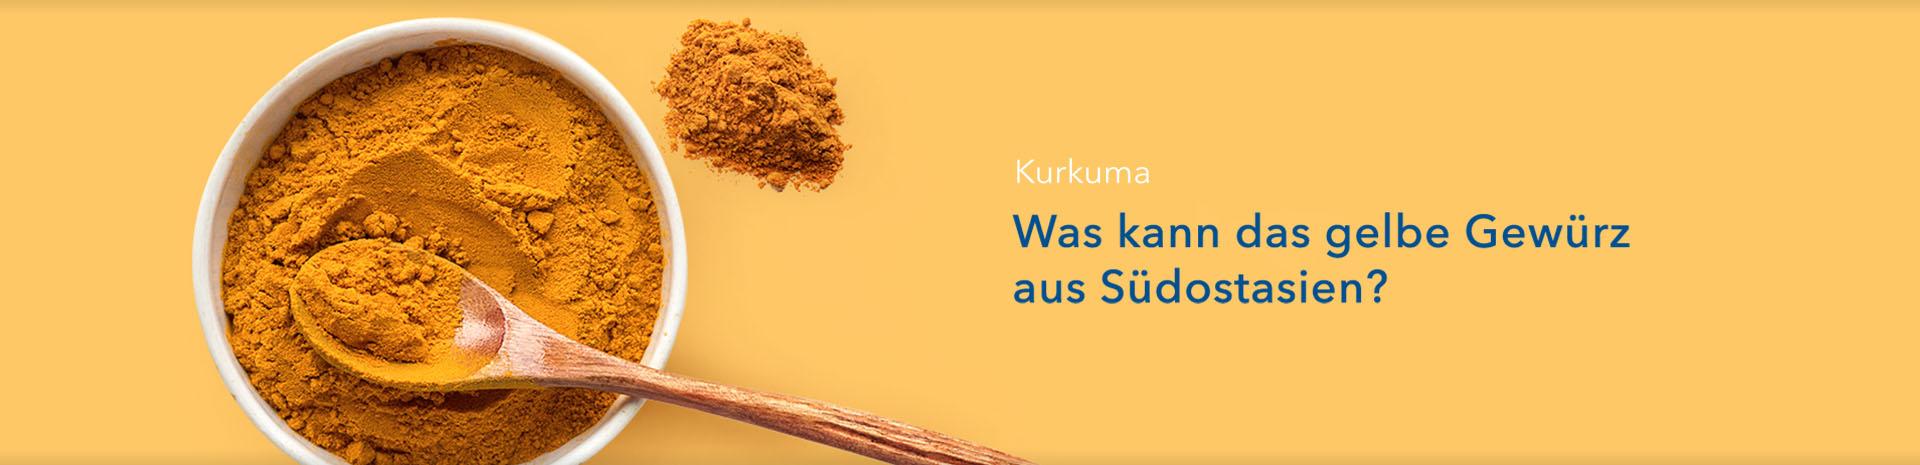 Superfood Kurkuma